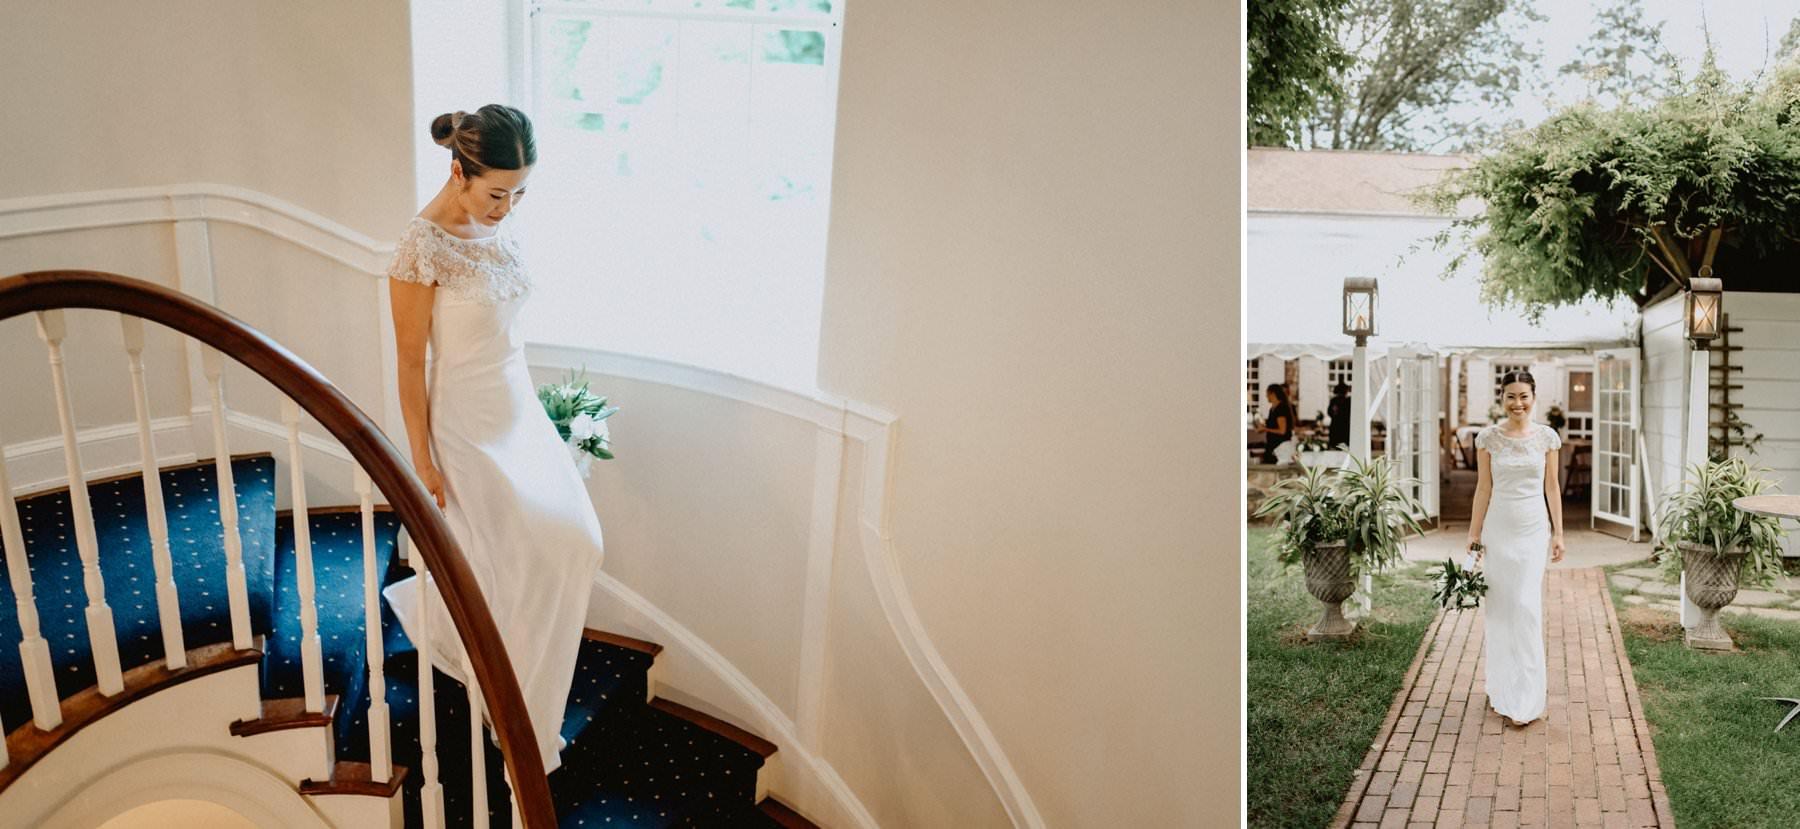 Appleford-estate-wedding-40.jpg